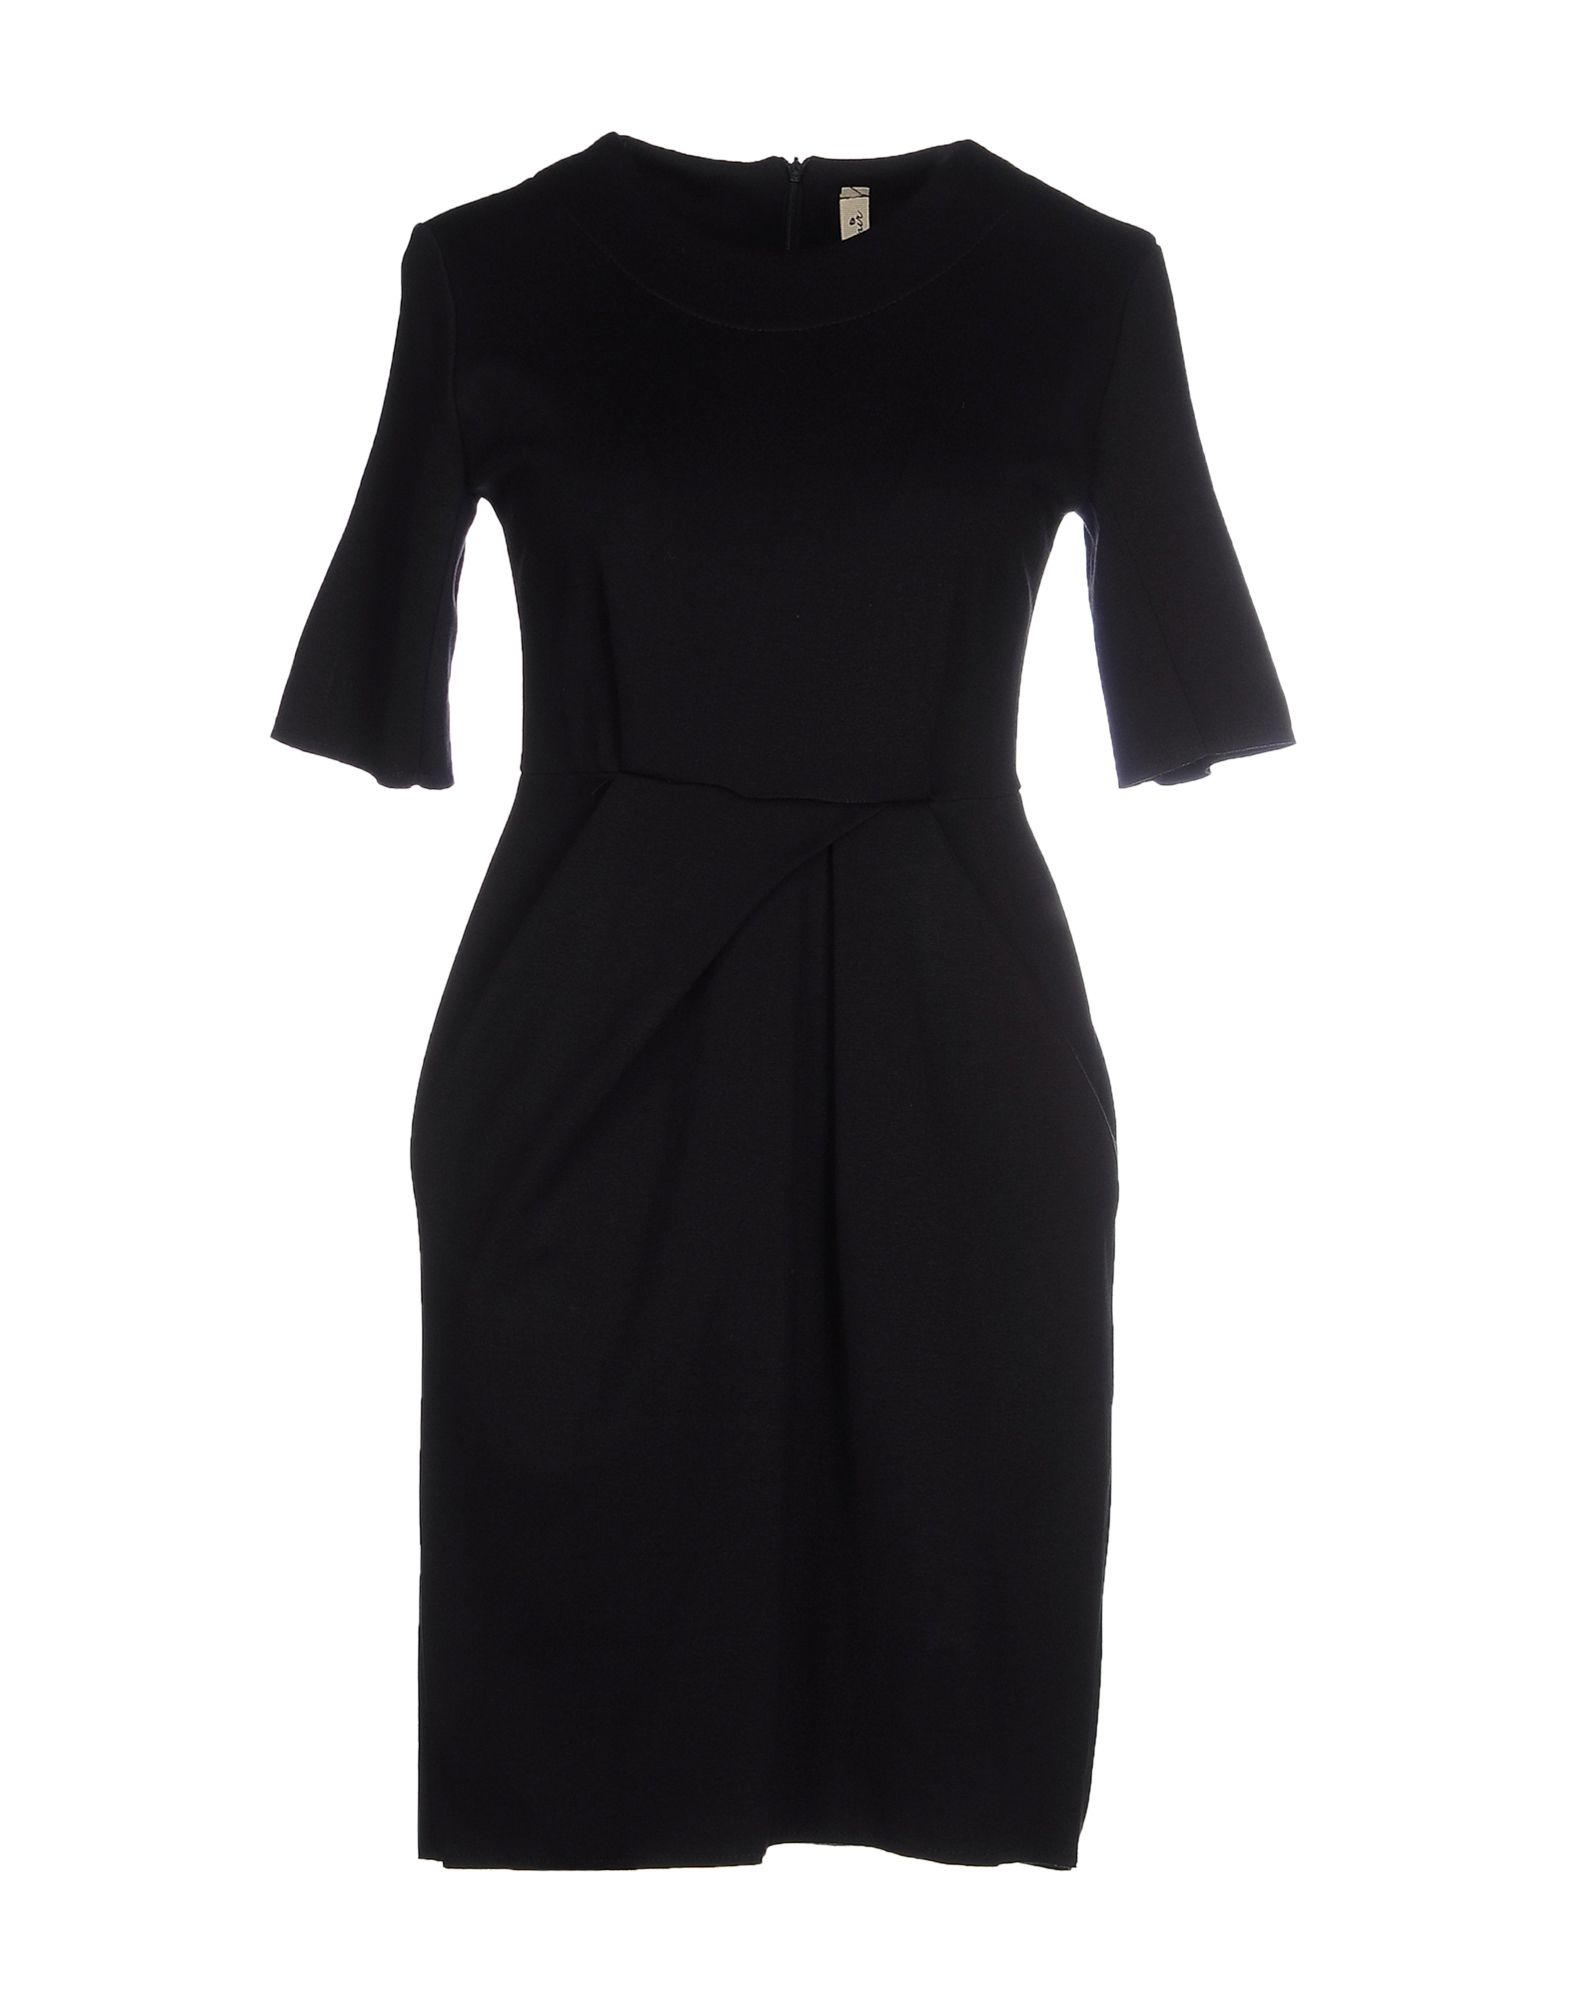 souvenir clubbing short dress in black lyst